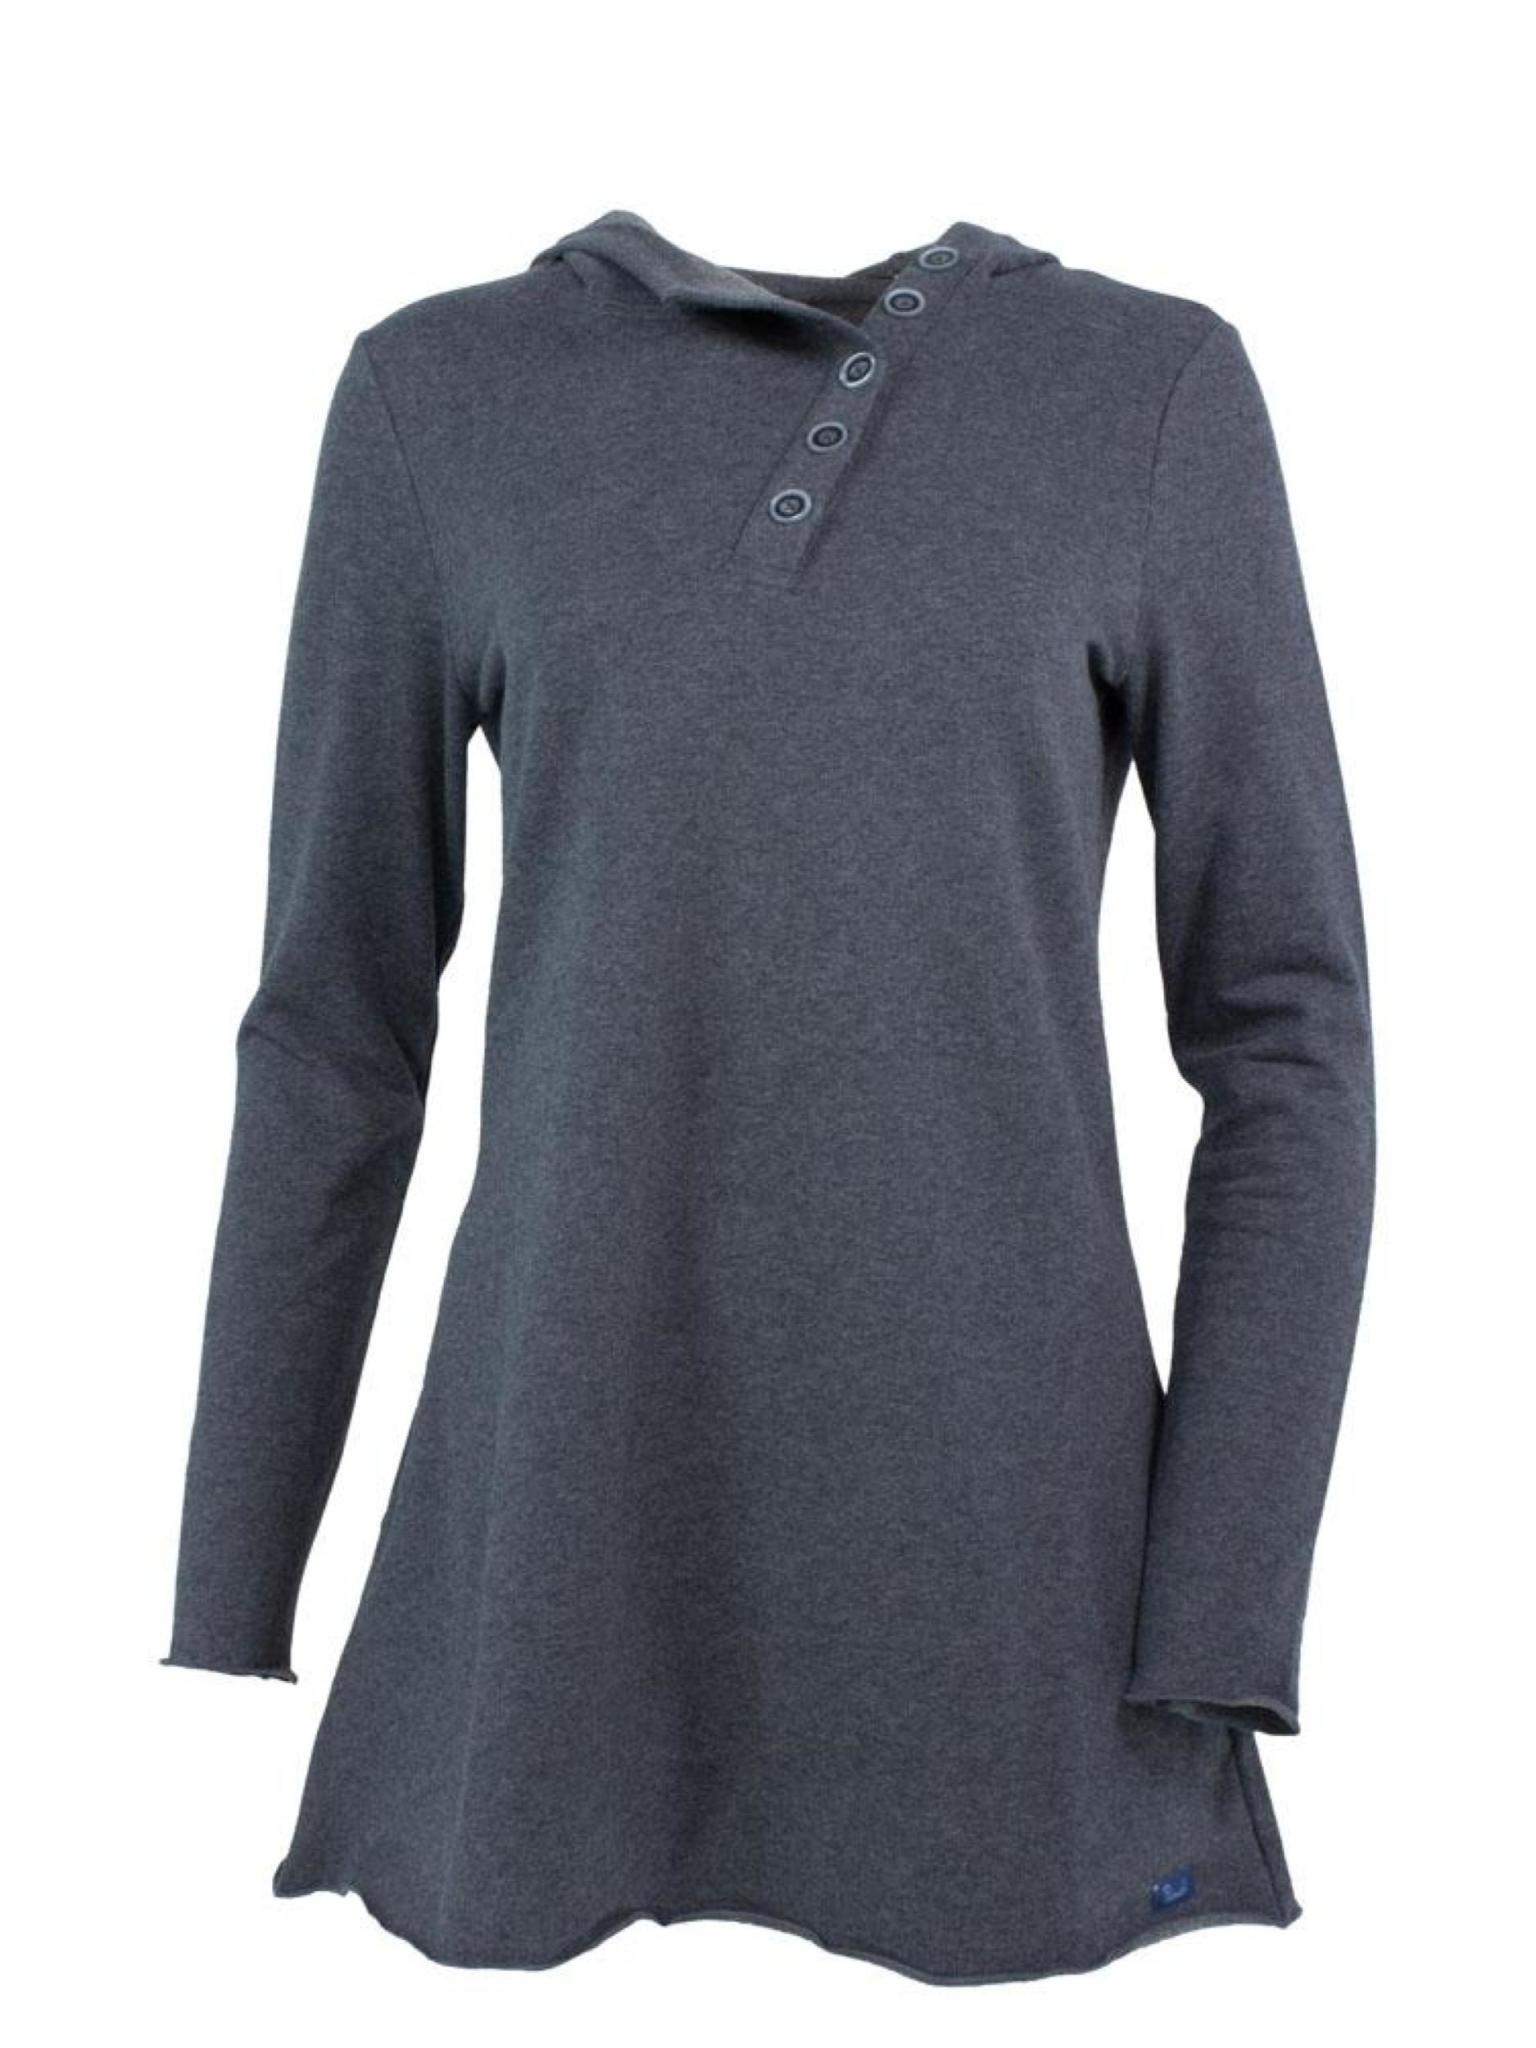 Purnell Women's Heathered Fleece Tunic